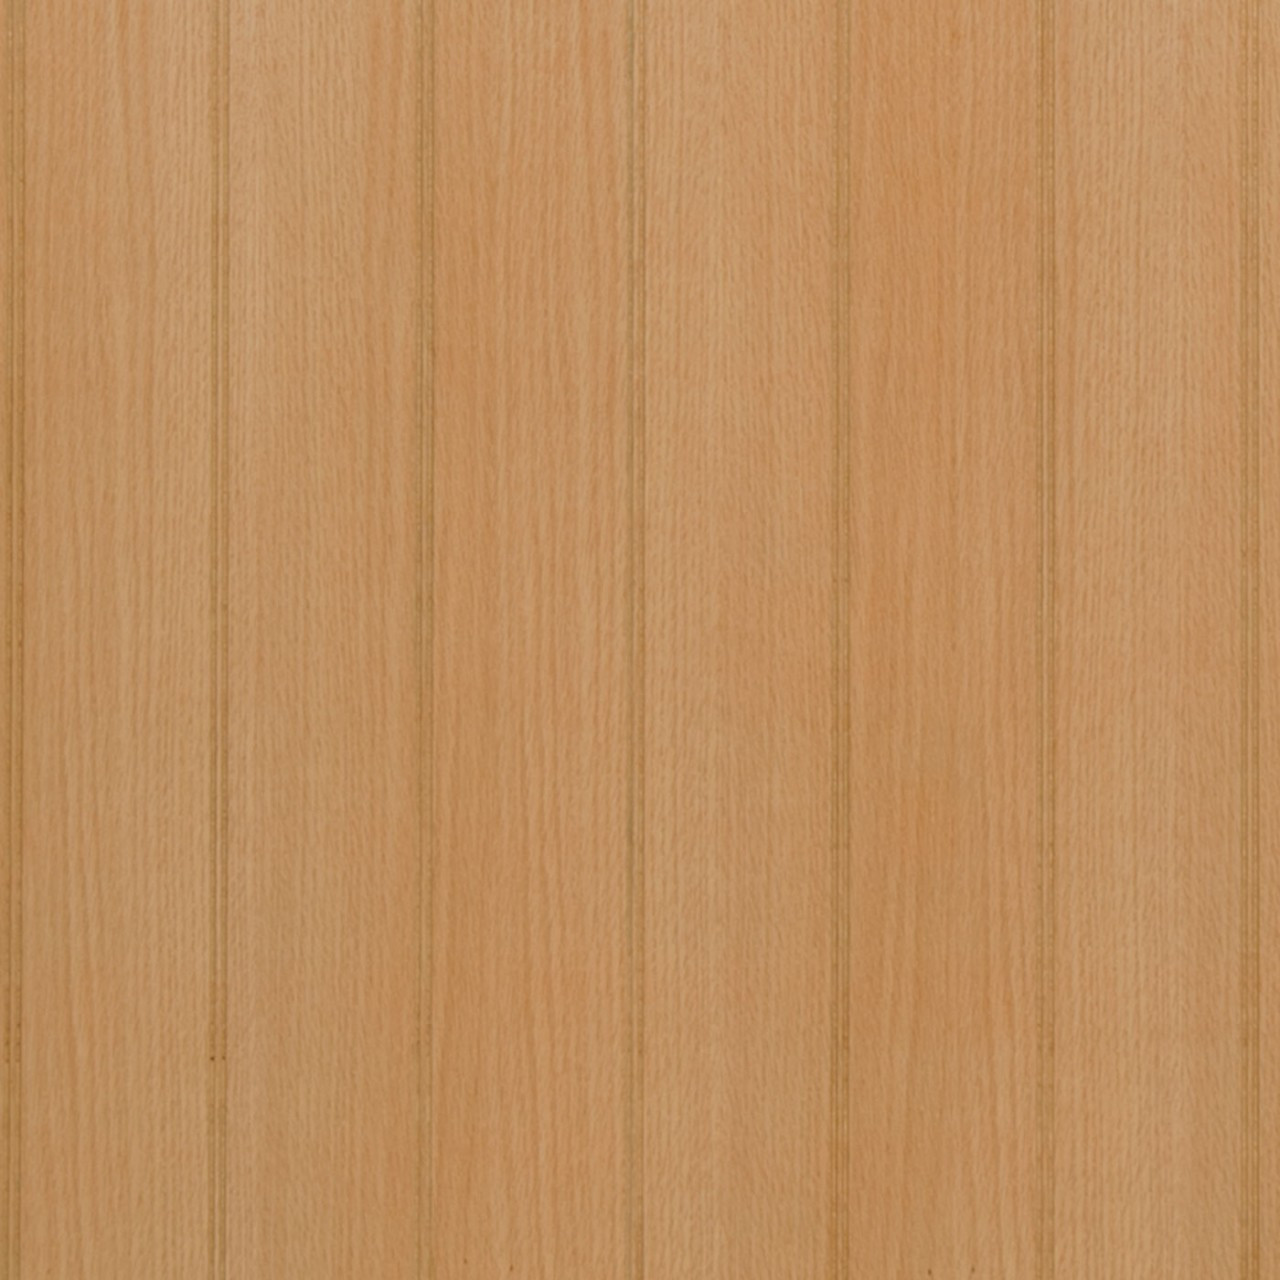 wood paneling 4 inch beadboard red oak veneer unfinished